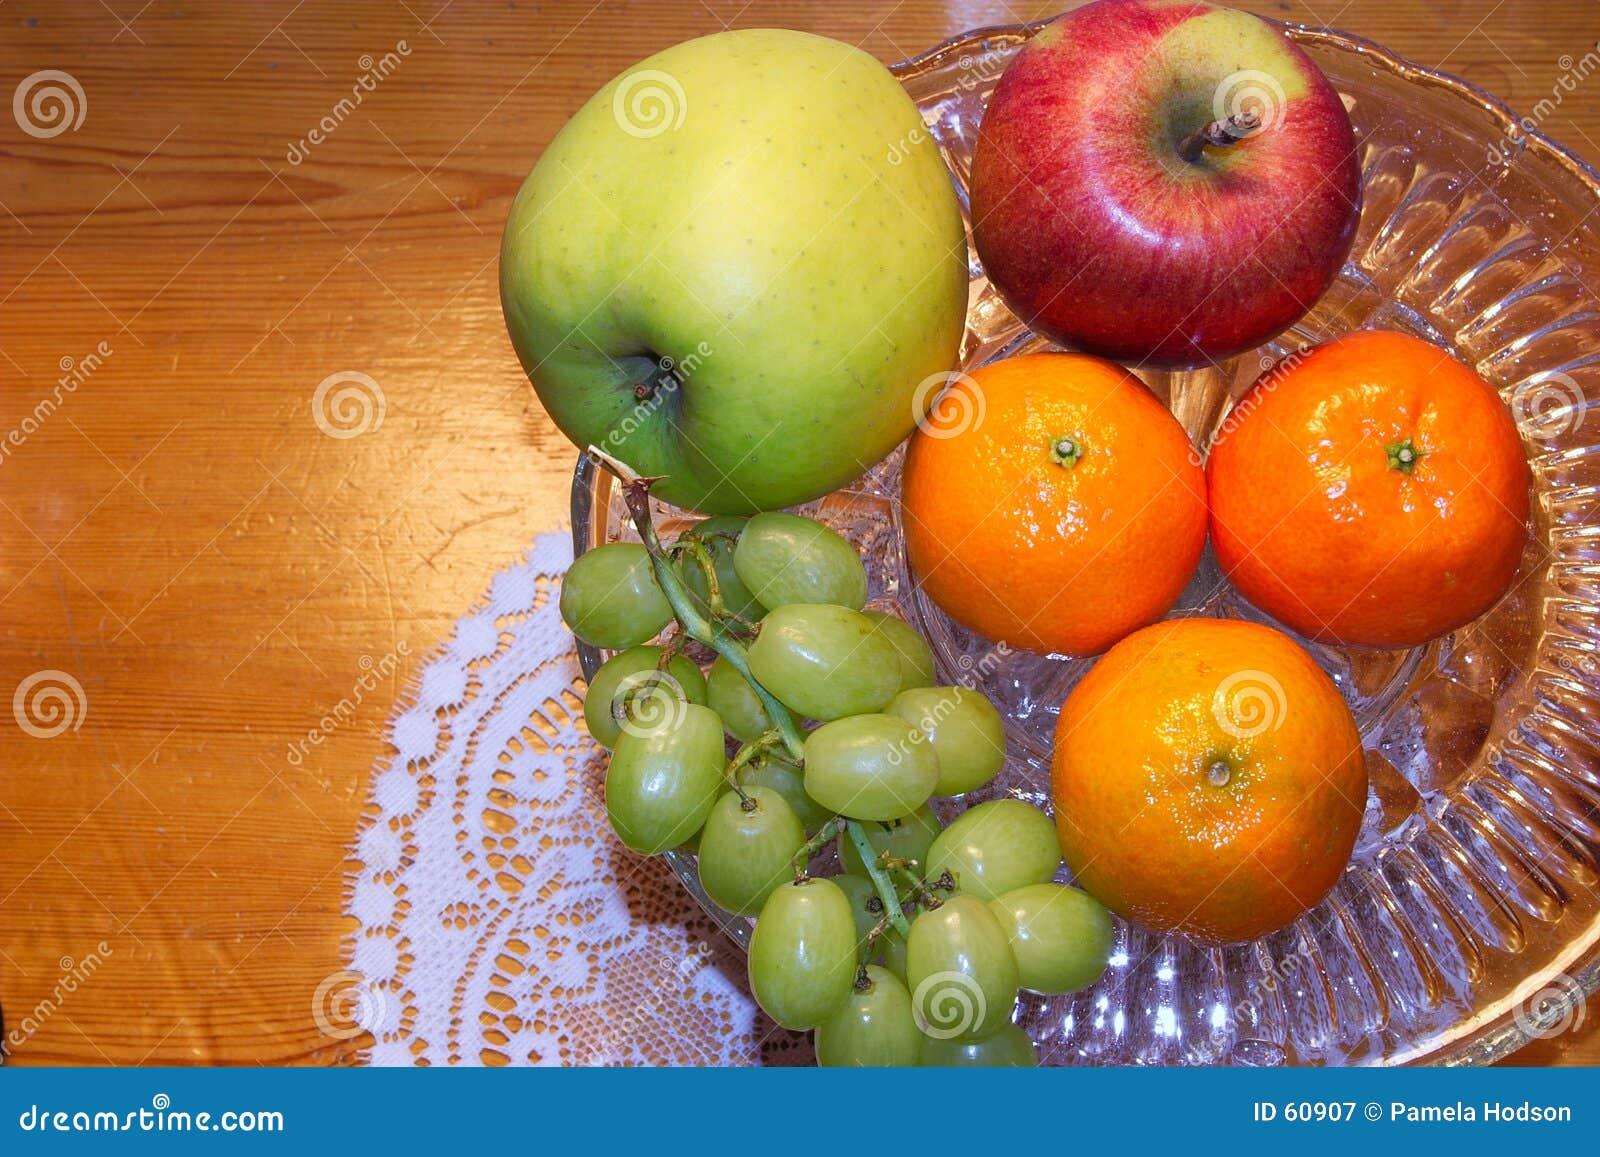 Con sabor a fruta